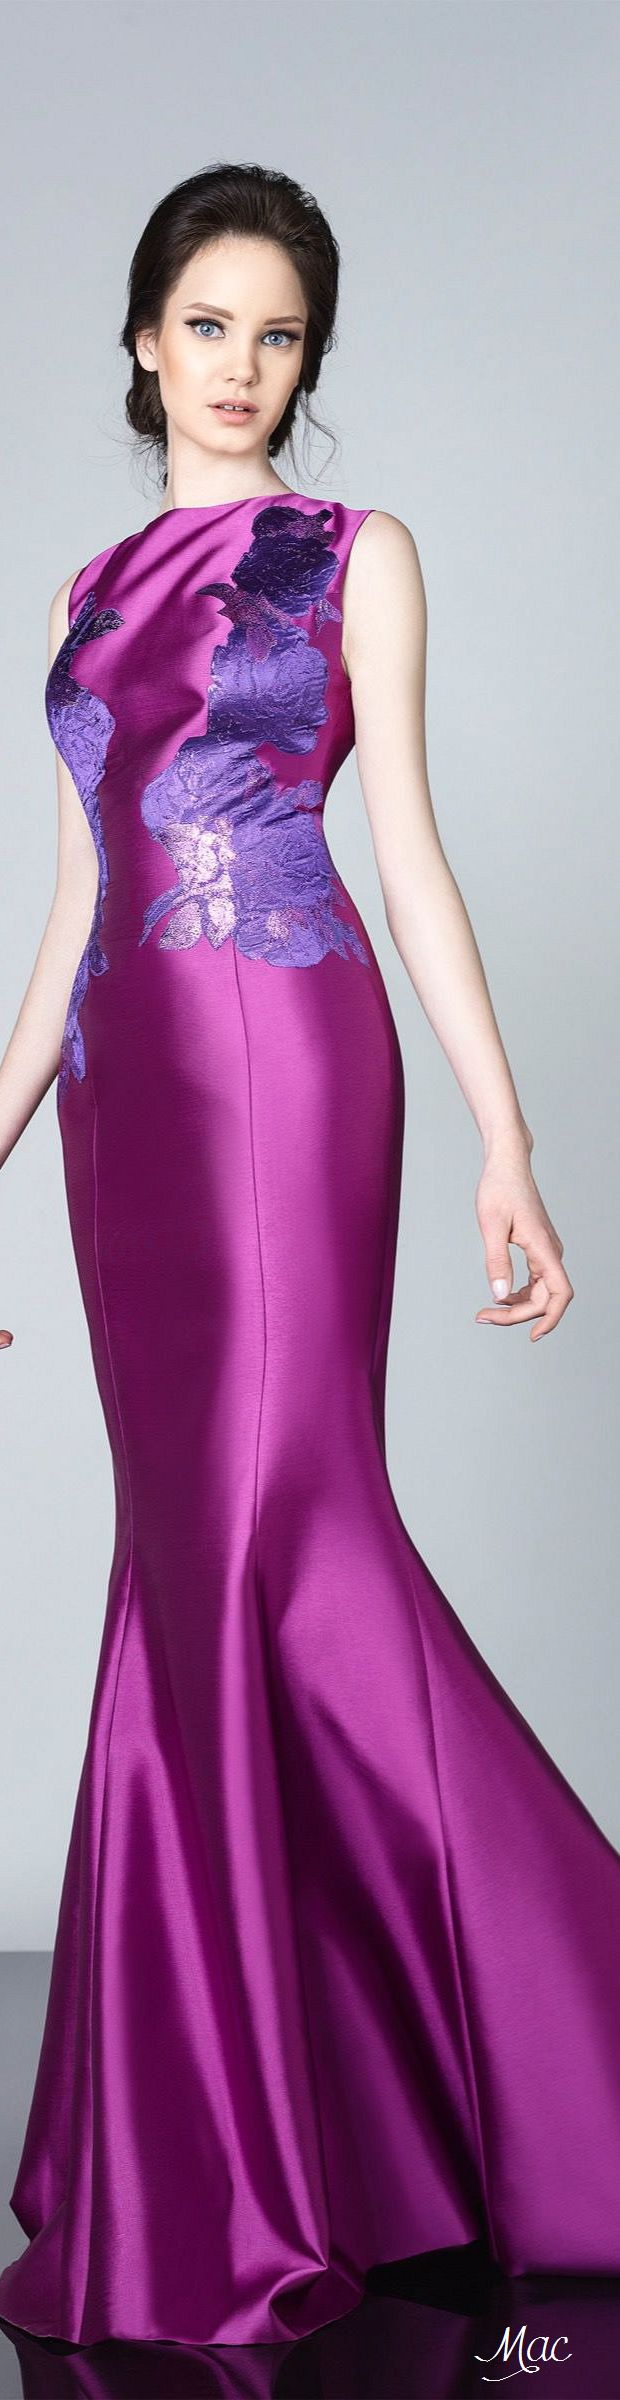 Mejores 771 imágenes de Fit for a princess en Pinterest | Vestidos ...